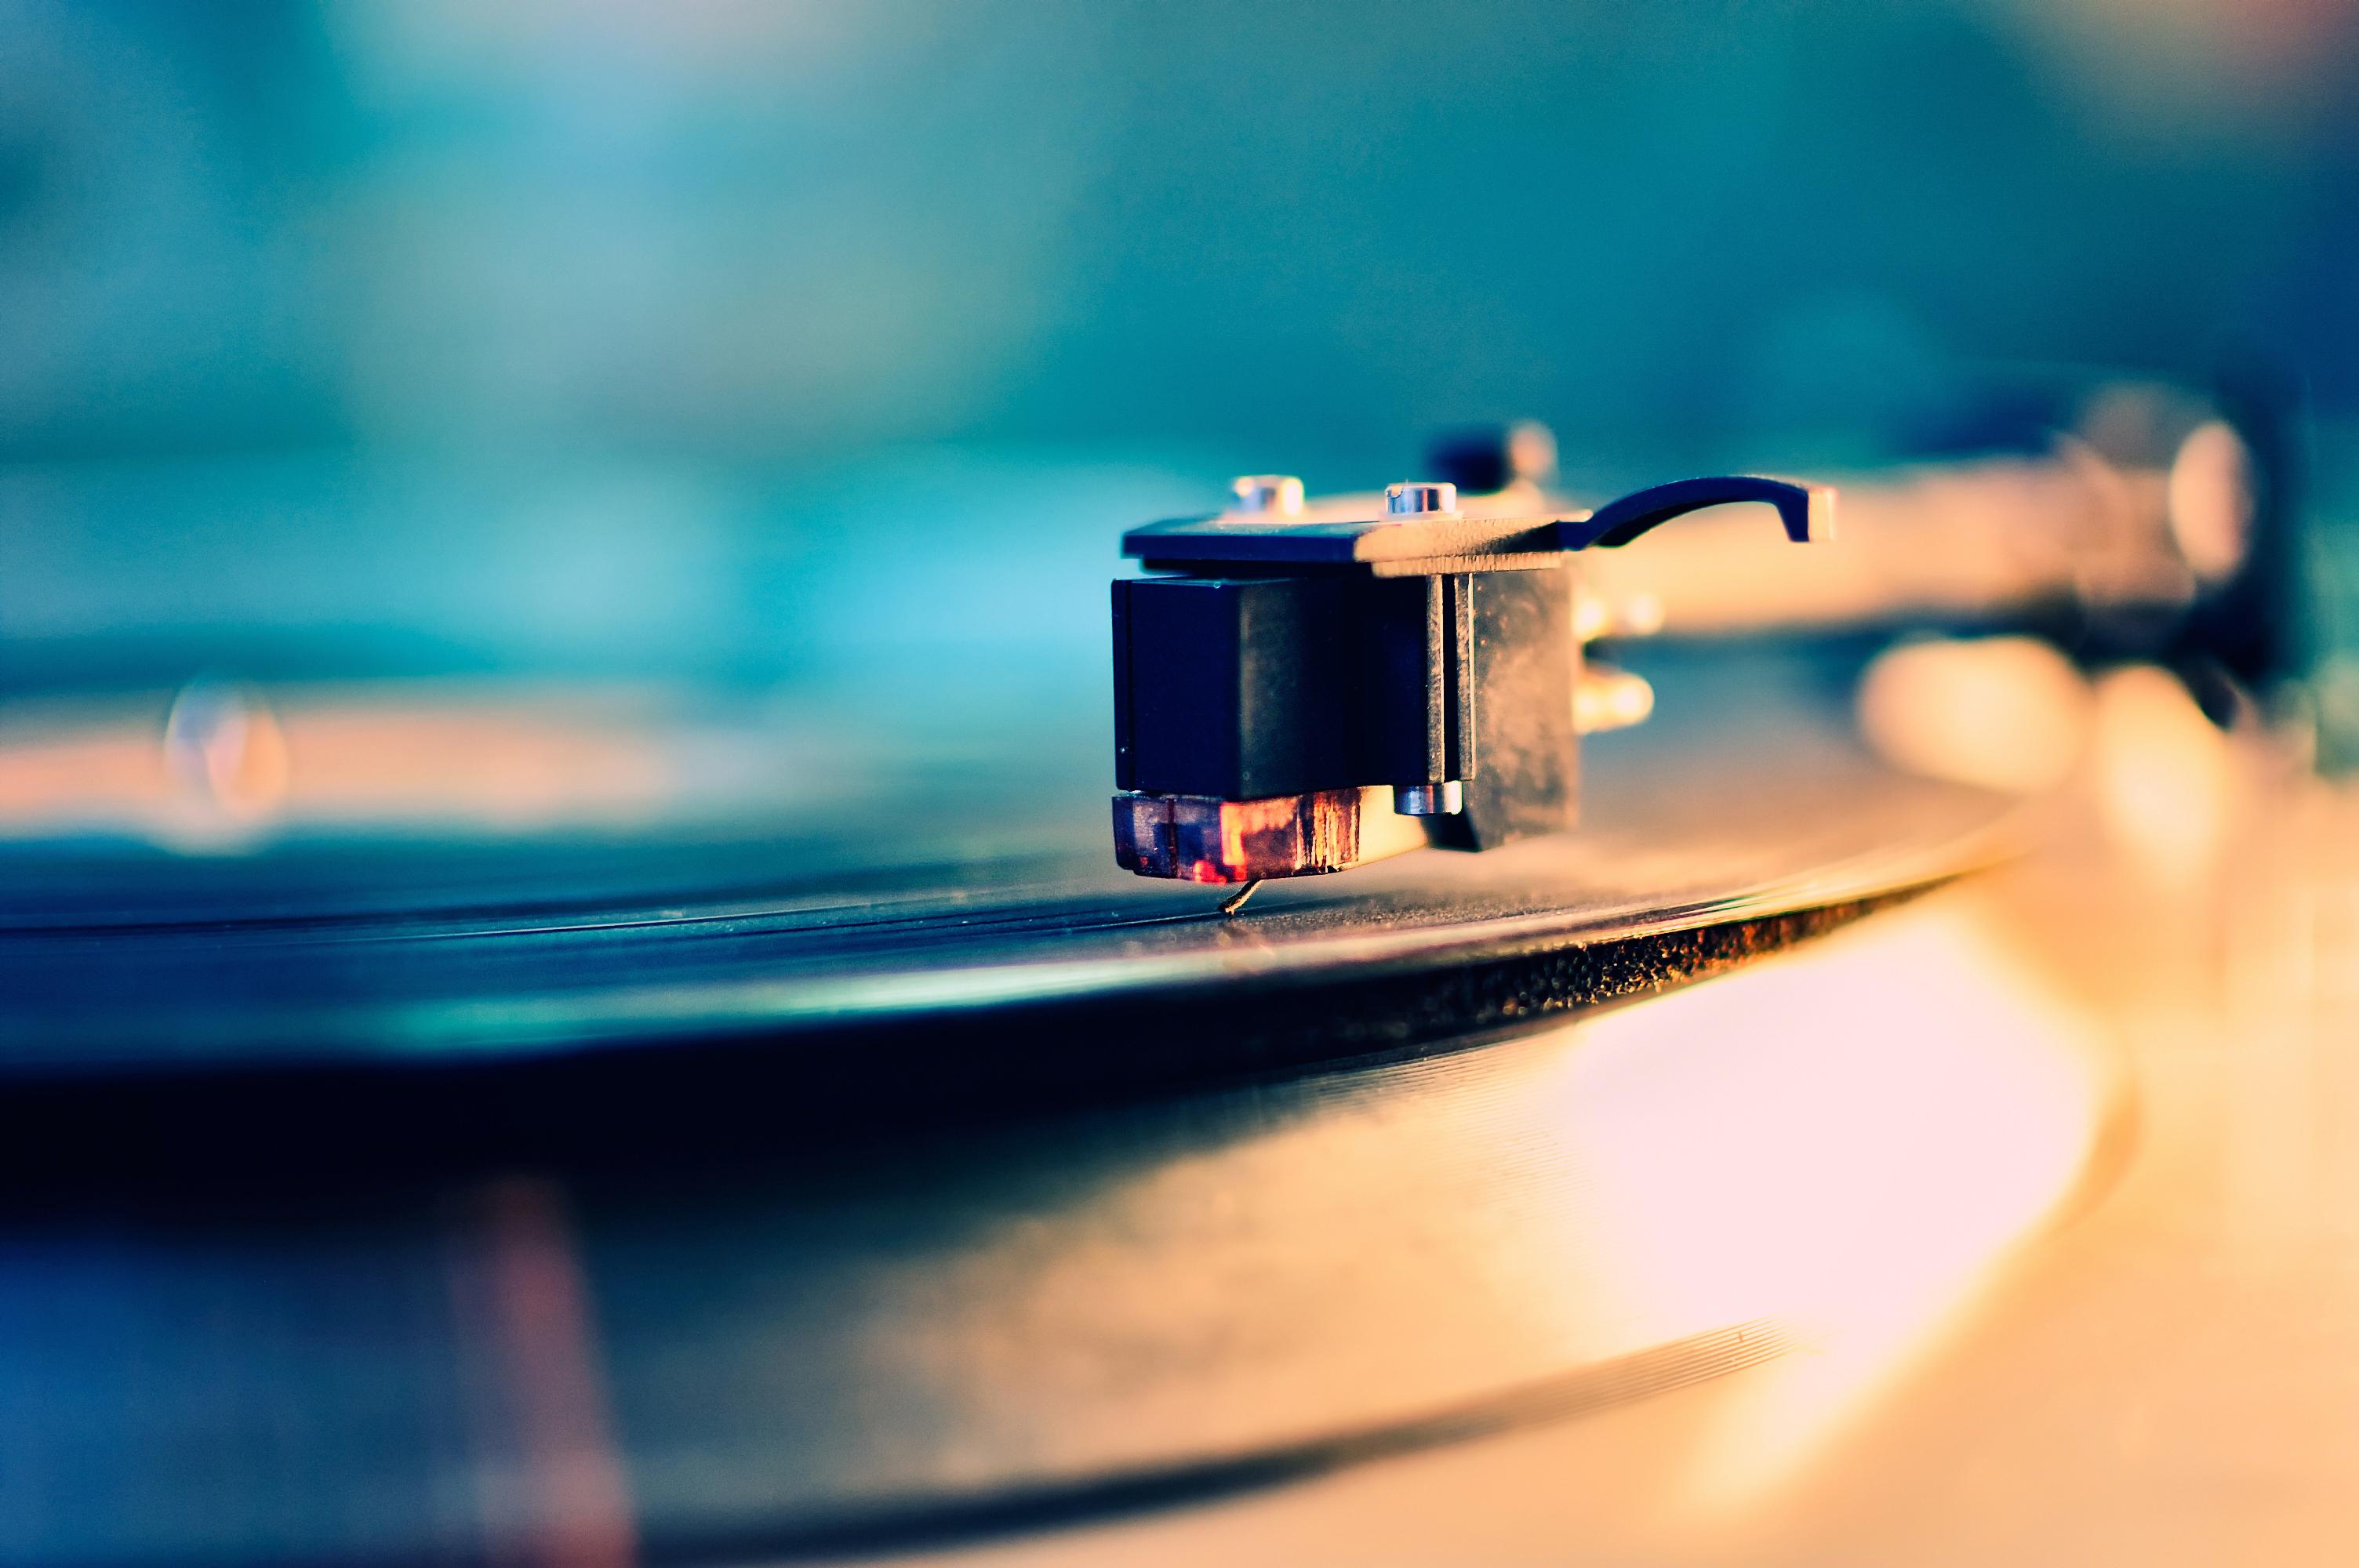 New Record Service VNYL Distributes LPs Like Netflix